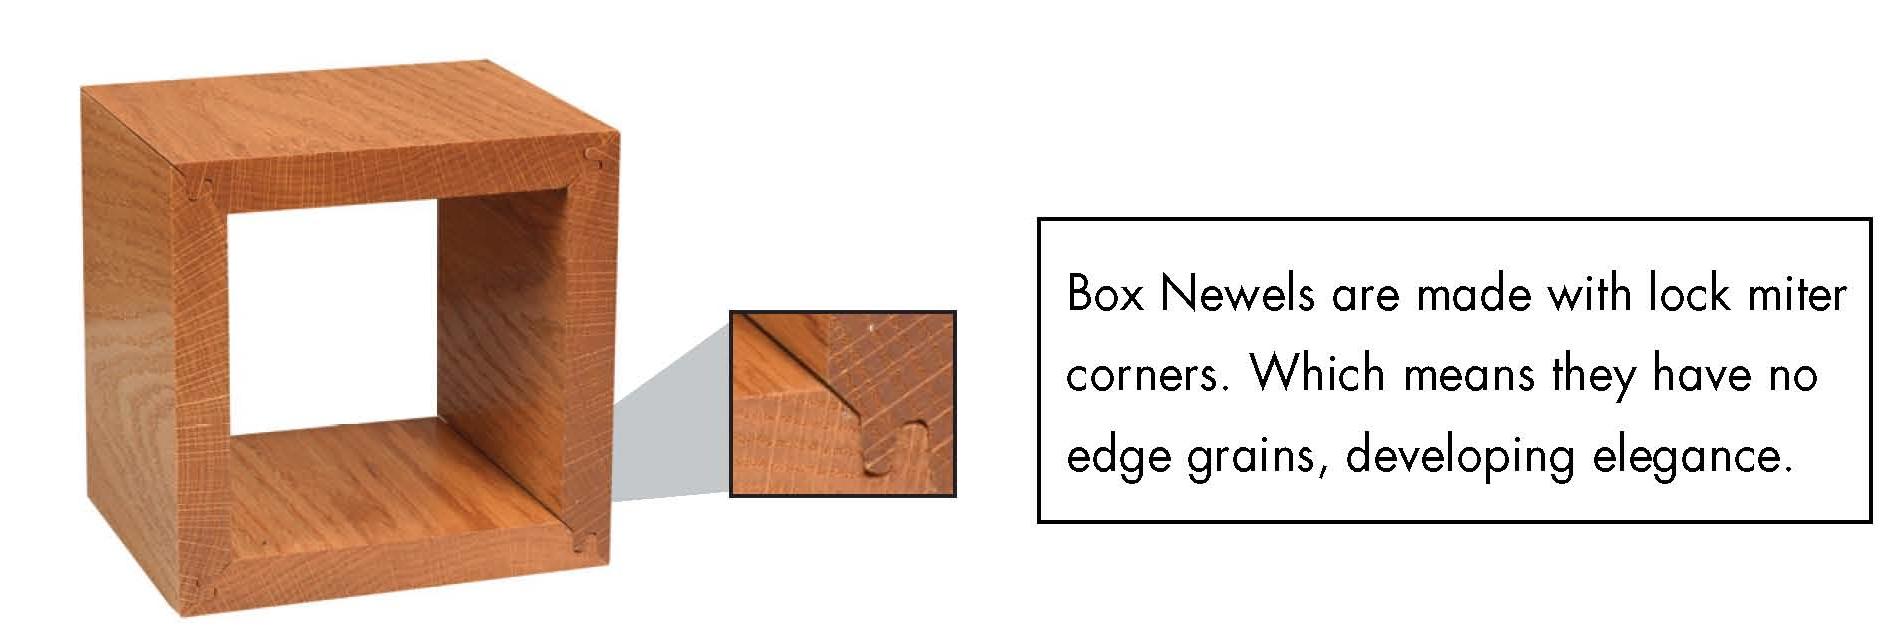 Lock Mitered Corners - Box Newel Post